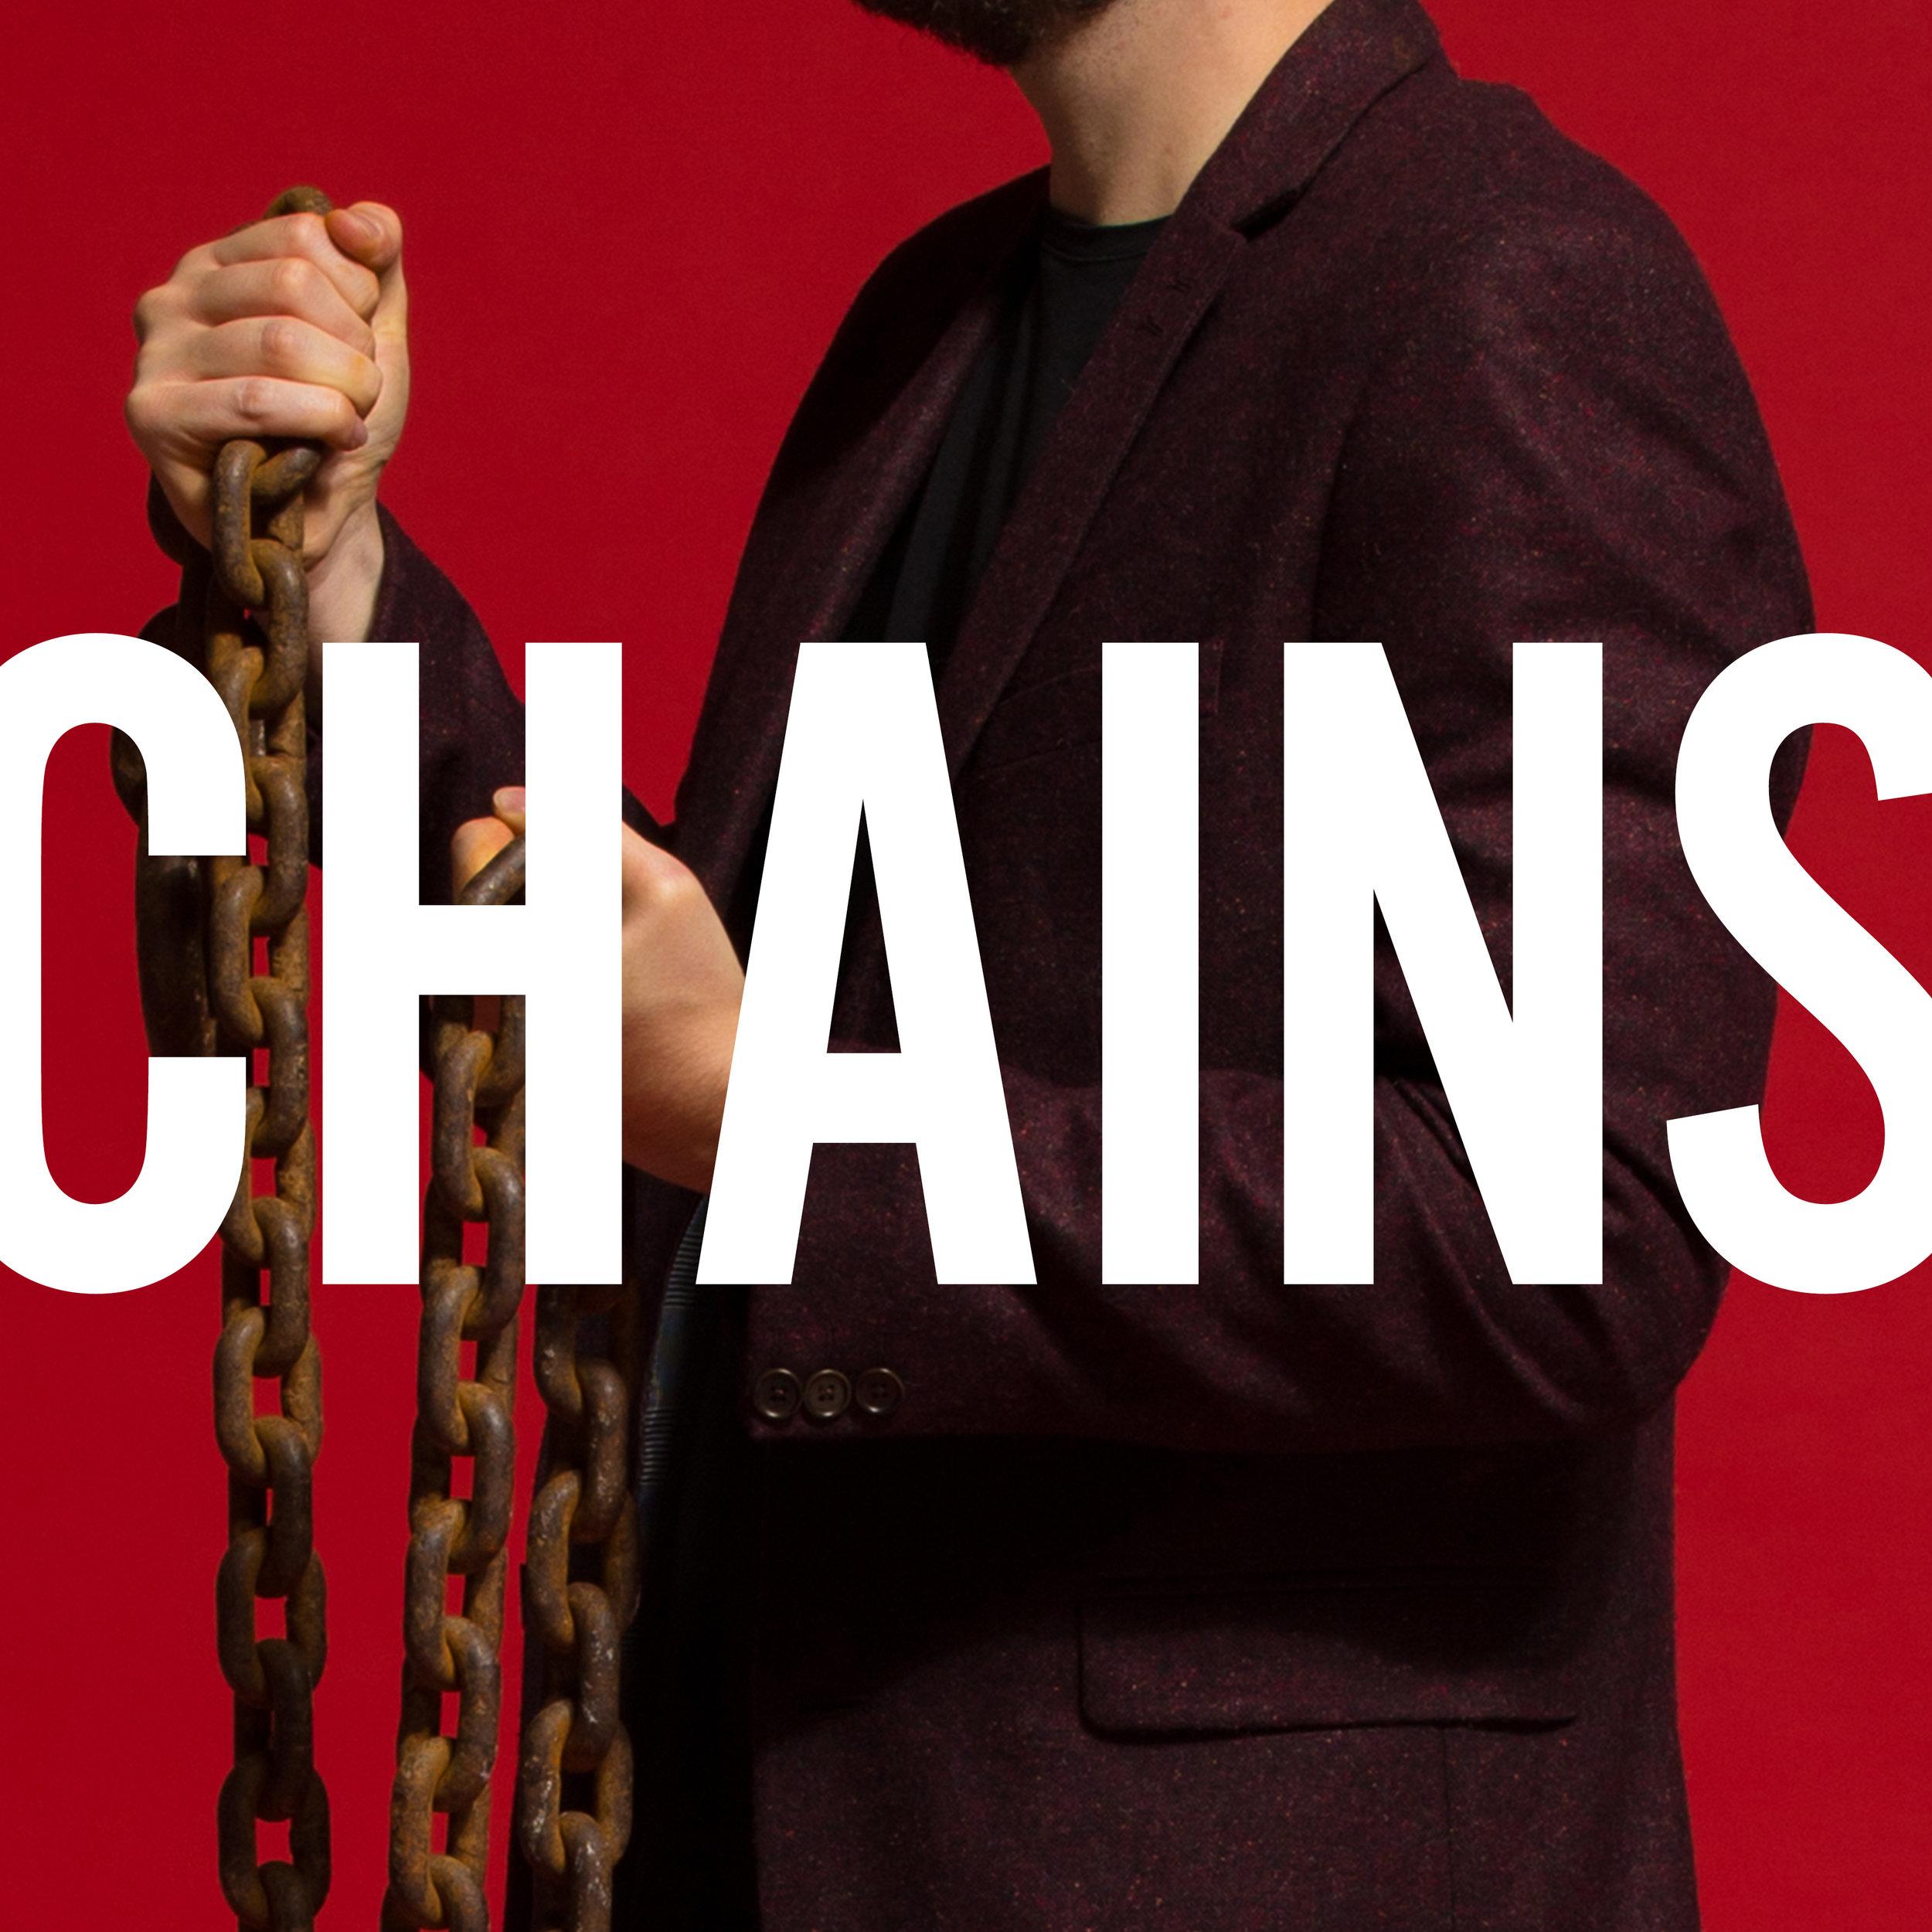 Chains Artwork.jpg